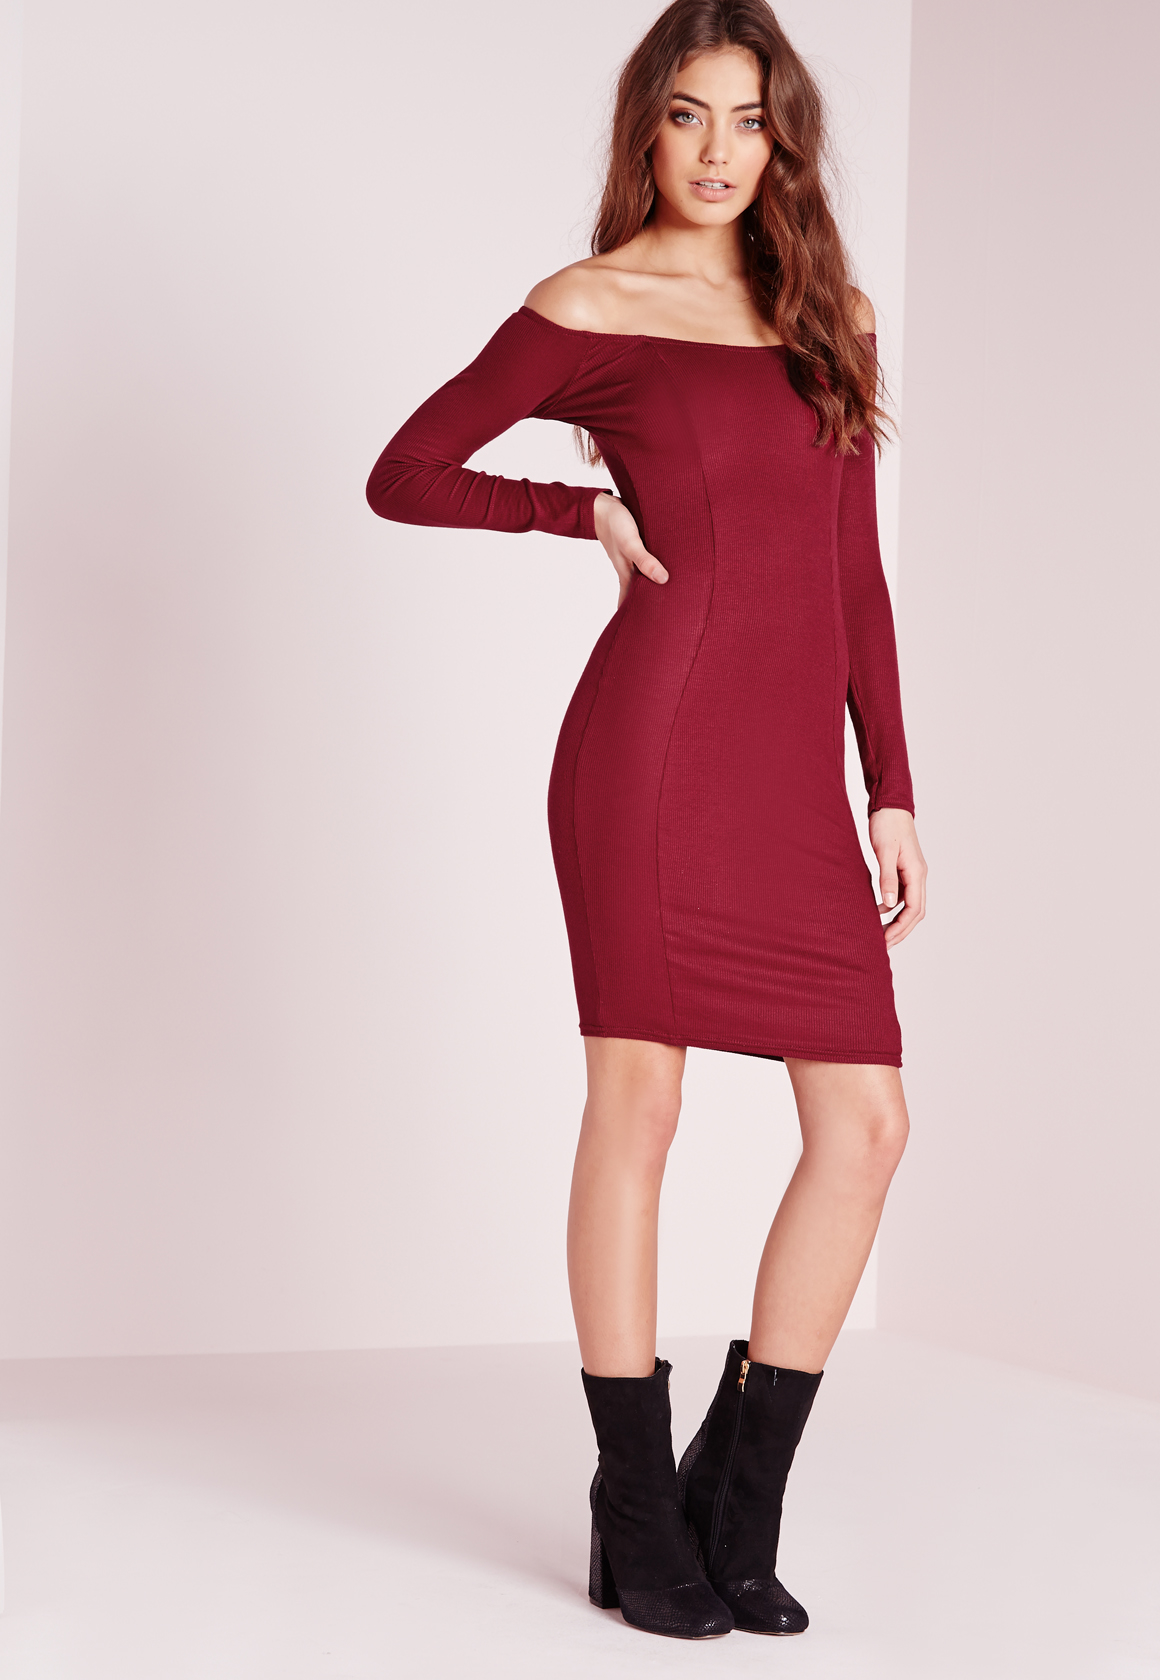 9bc9bd09b3d Missguided Ribbed Jersey Long Sleeve Bardot Bodycon Dress Burgundy ...